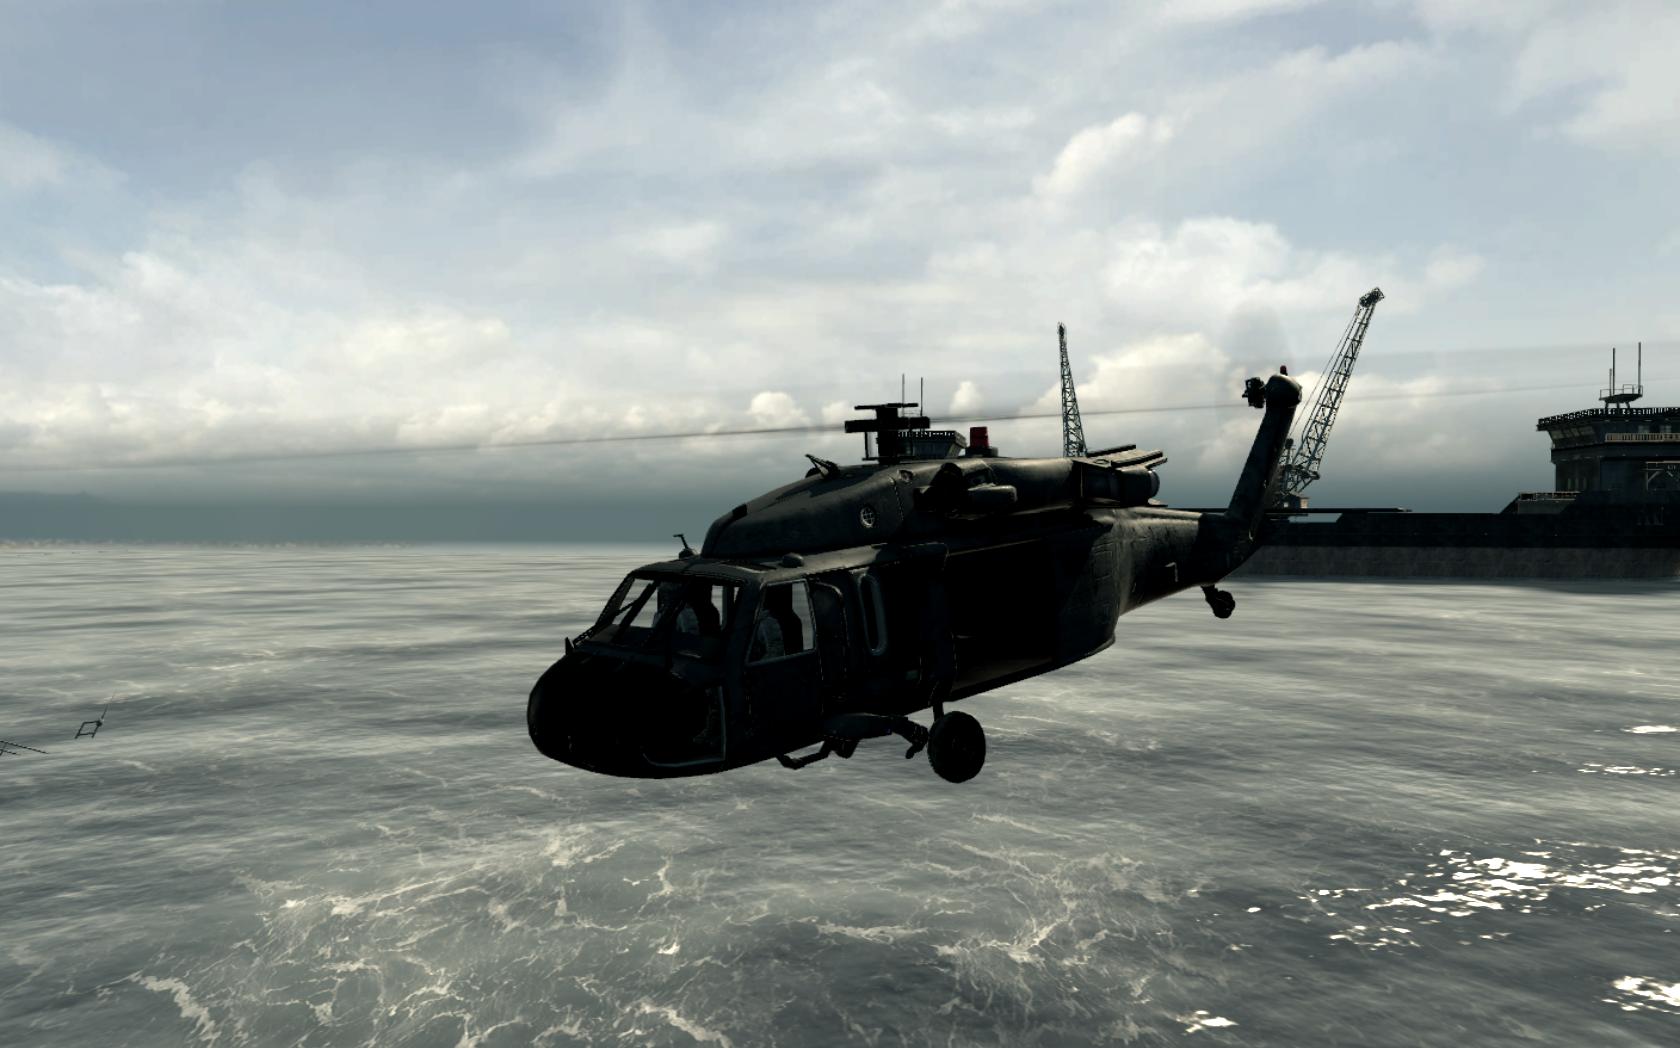 915744104f6 UH-60 Blackhawk | Call of Duty Wiki | FANDOM powered by Wikia